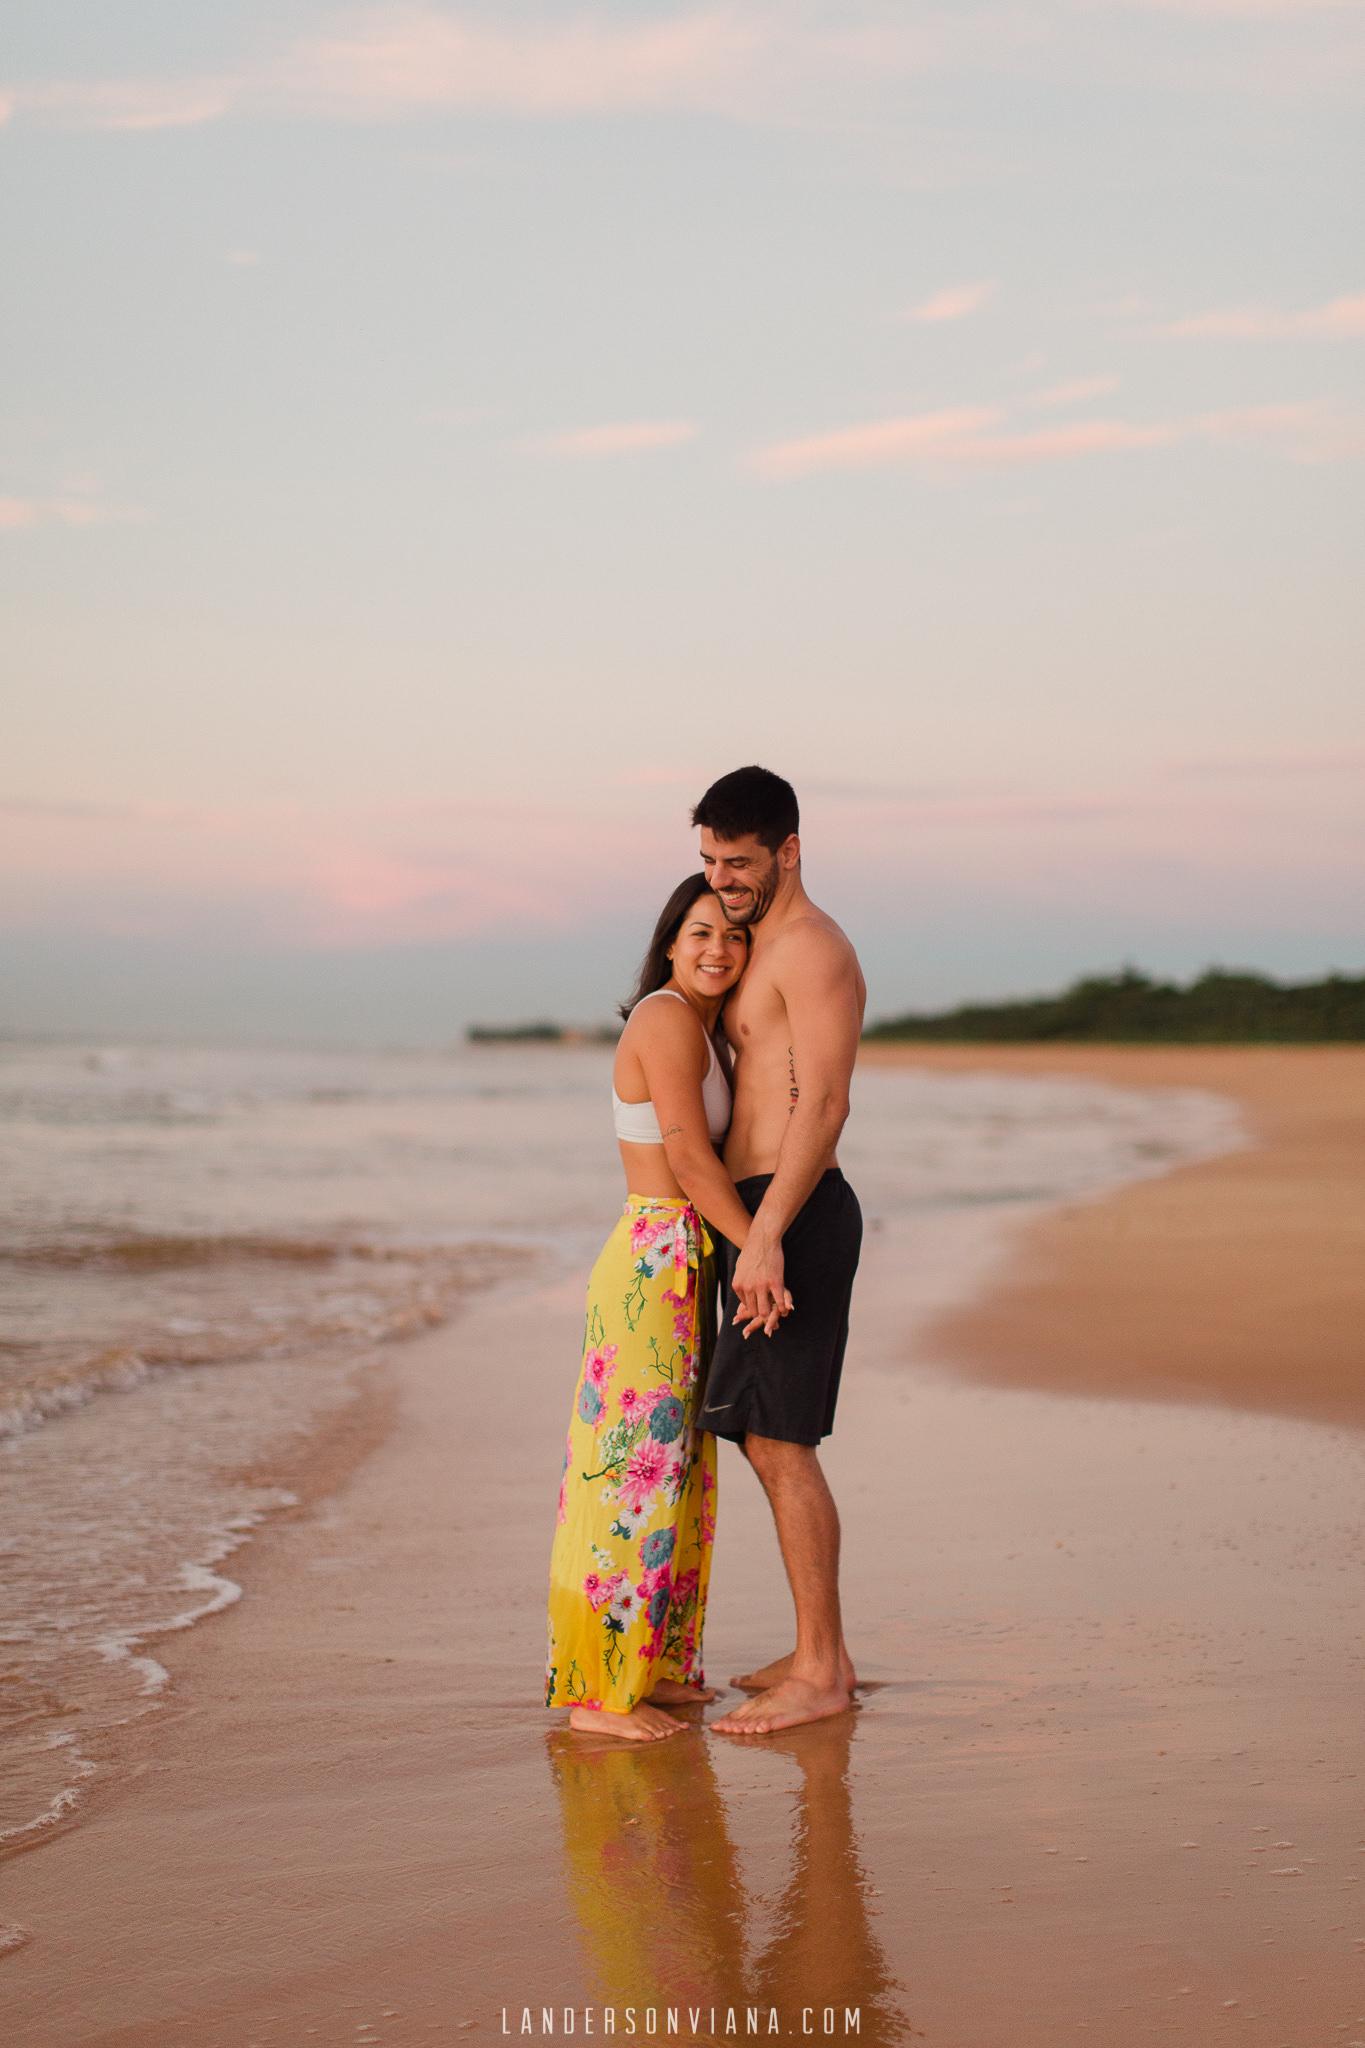 ensaio-pre-wedding-praia-landerson-viana-fotografia-casamento-pegueiobouquet-56.jpg